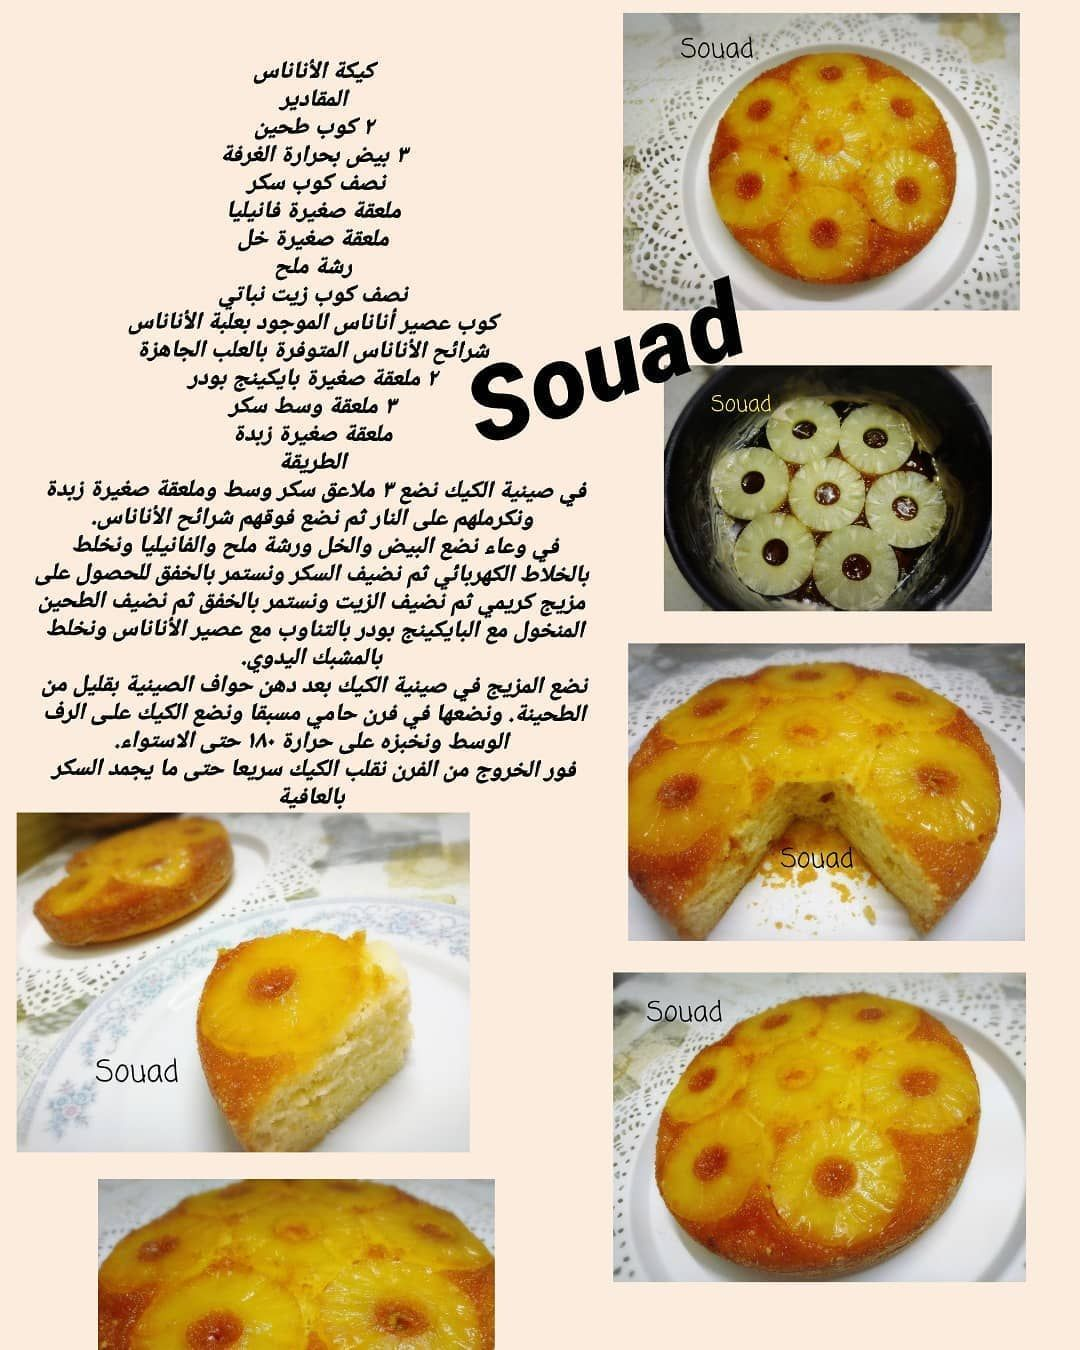 9 Likes 0 Comments Souad Hosna Souadhosna On Instagram كيكة الأناناس طبخات مصوره طبخات لذيذة اطباقي لذيذ اكلاتي طبخات لذيذة Food Breakfast Eggs